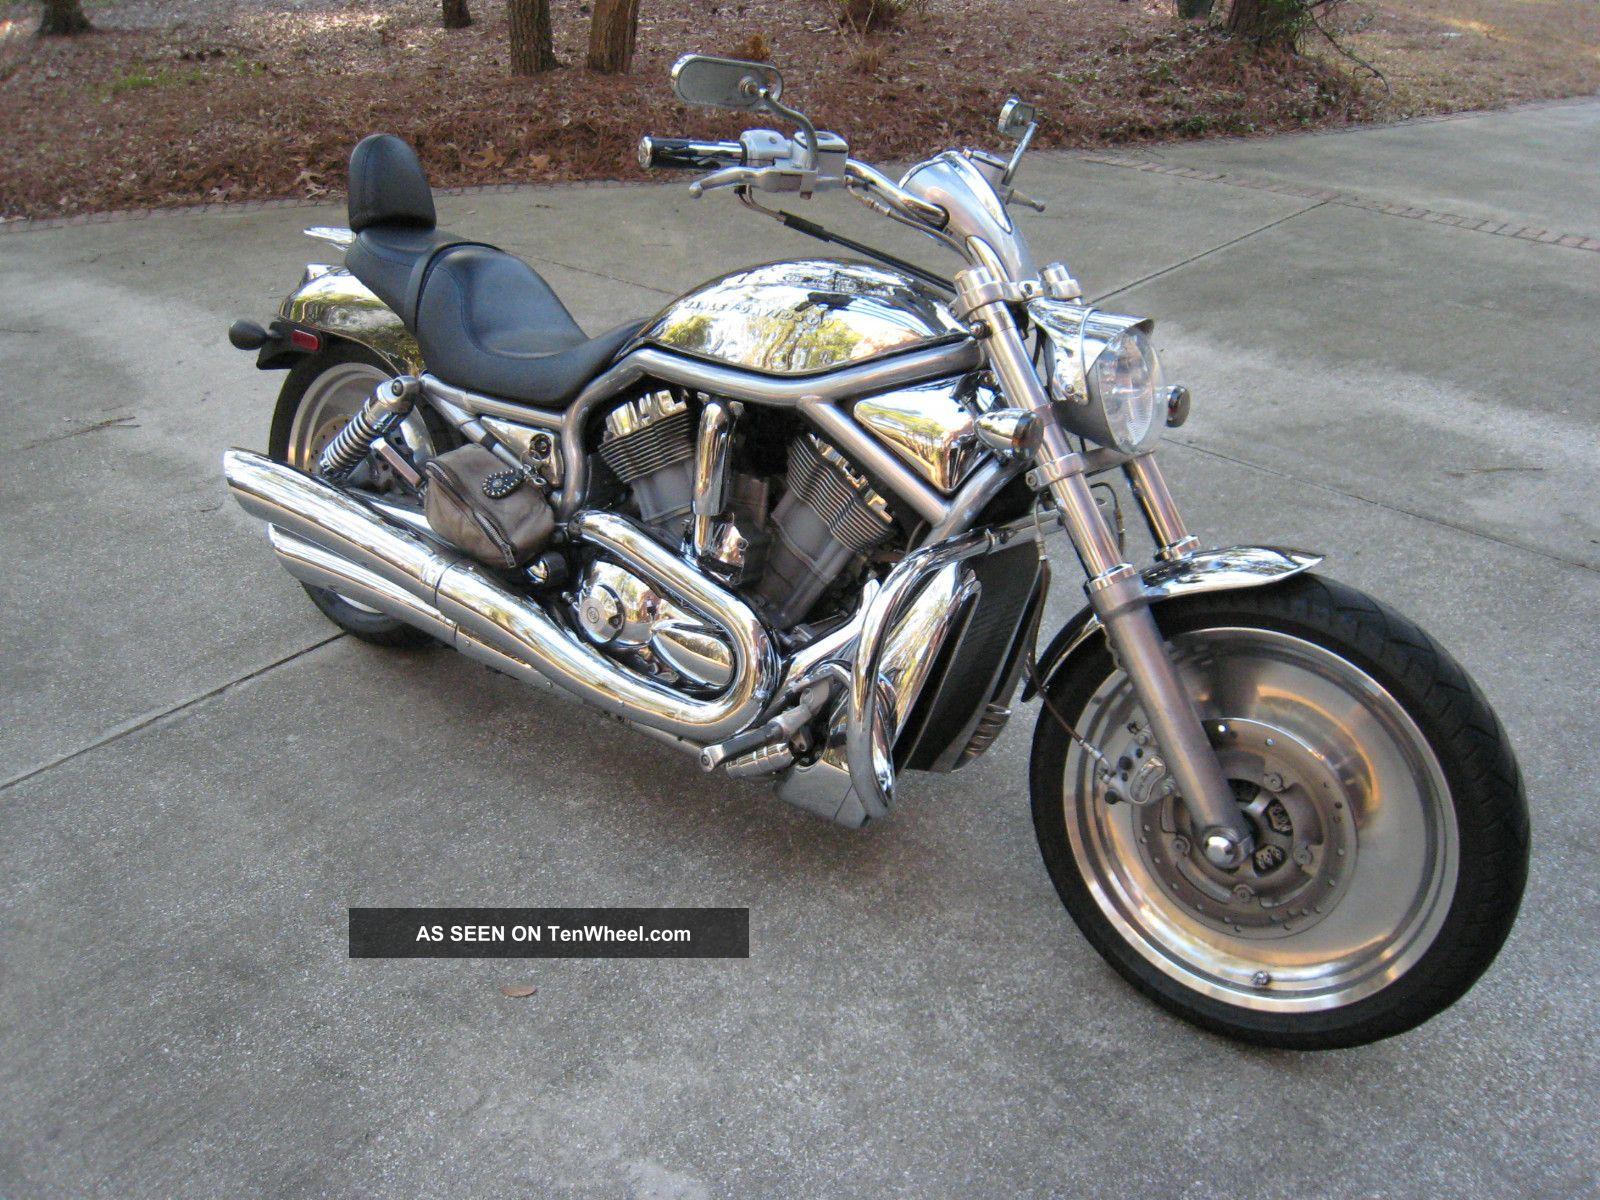 2004 Harley Davidson V - Rod Vrsca Chromed Out. VRSC photo